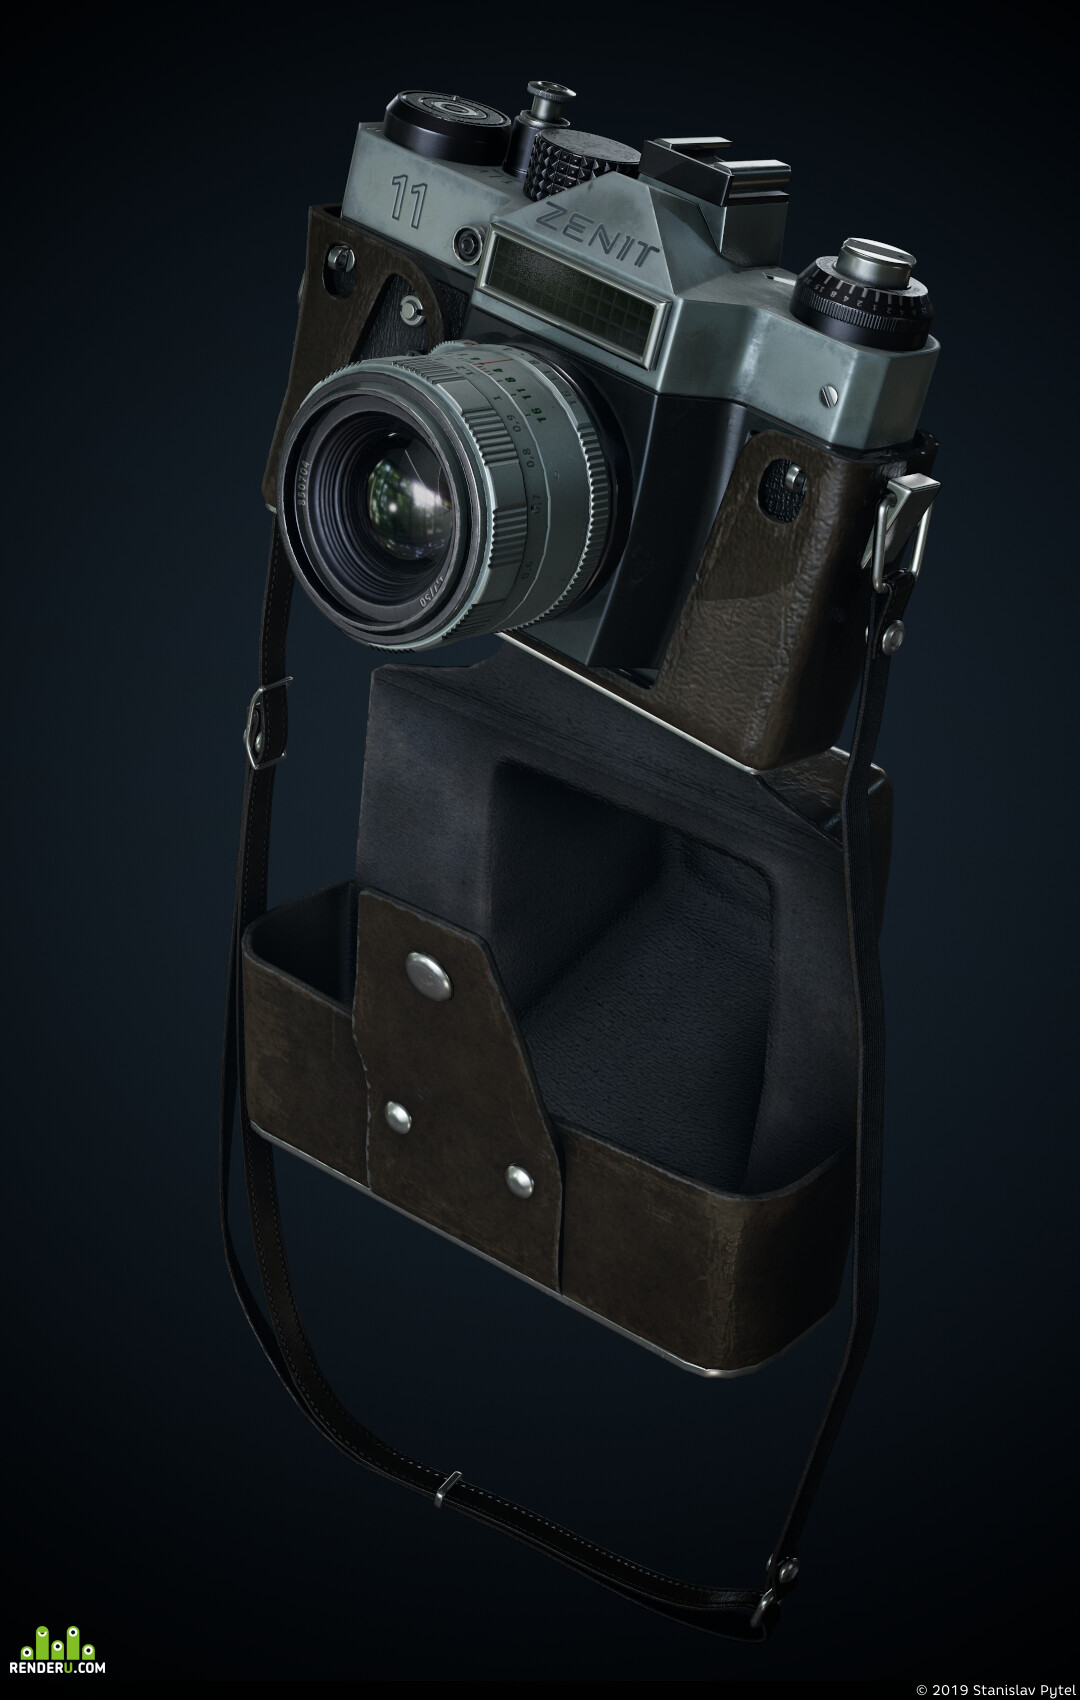 Зенит, Фотоаппарат, Blender, substance, PBR